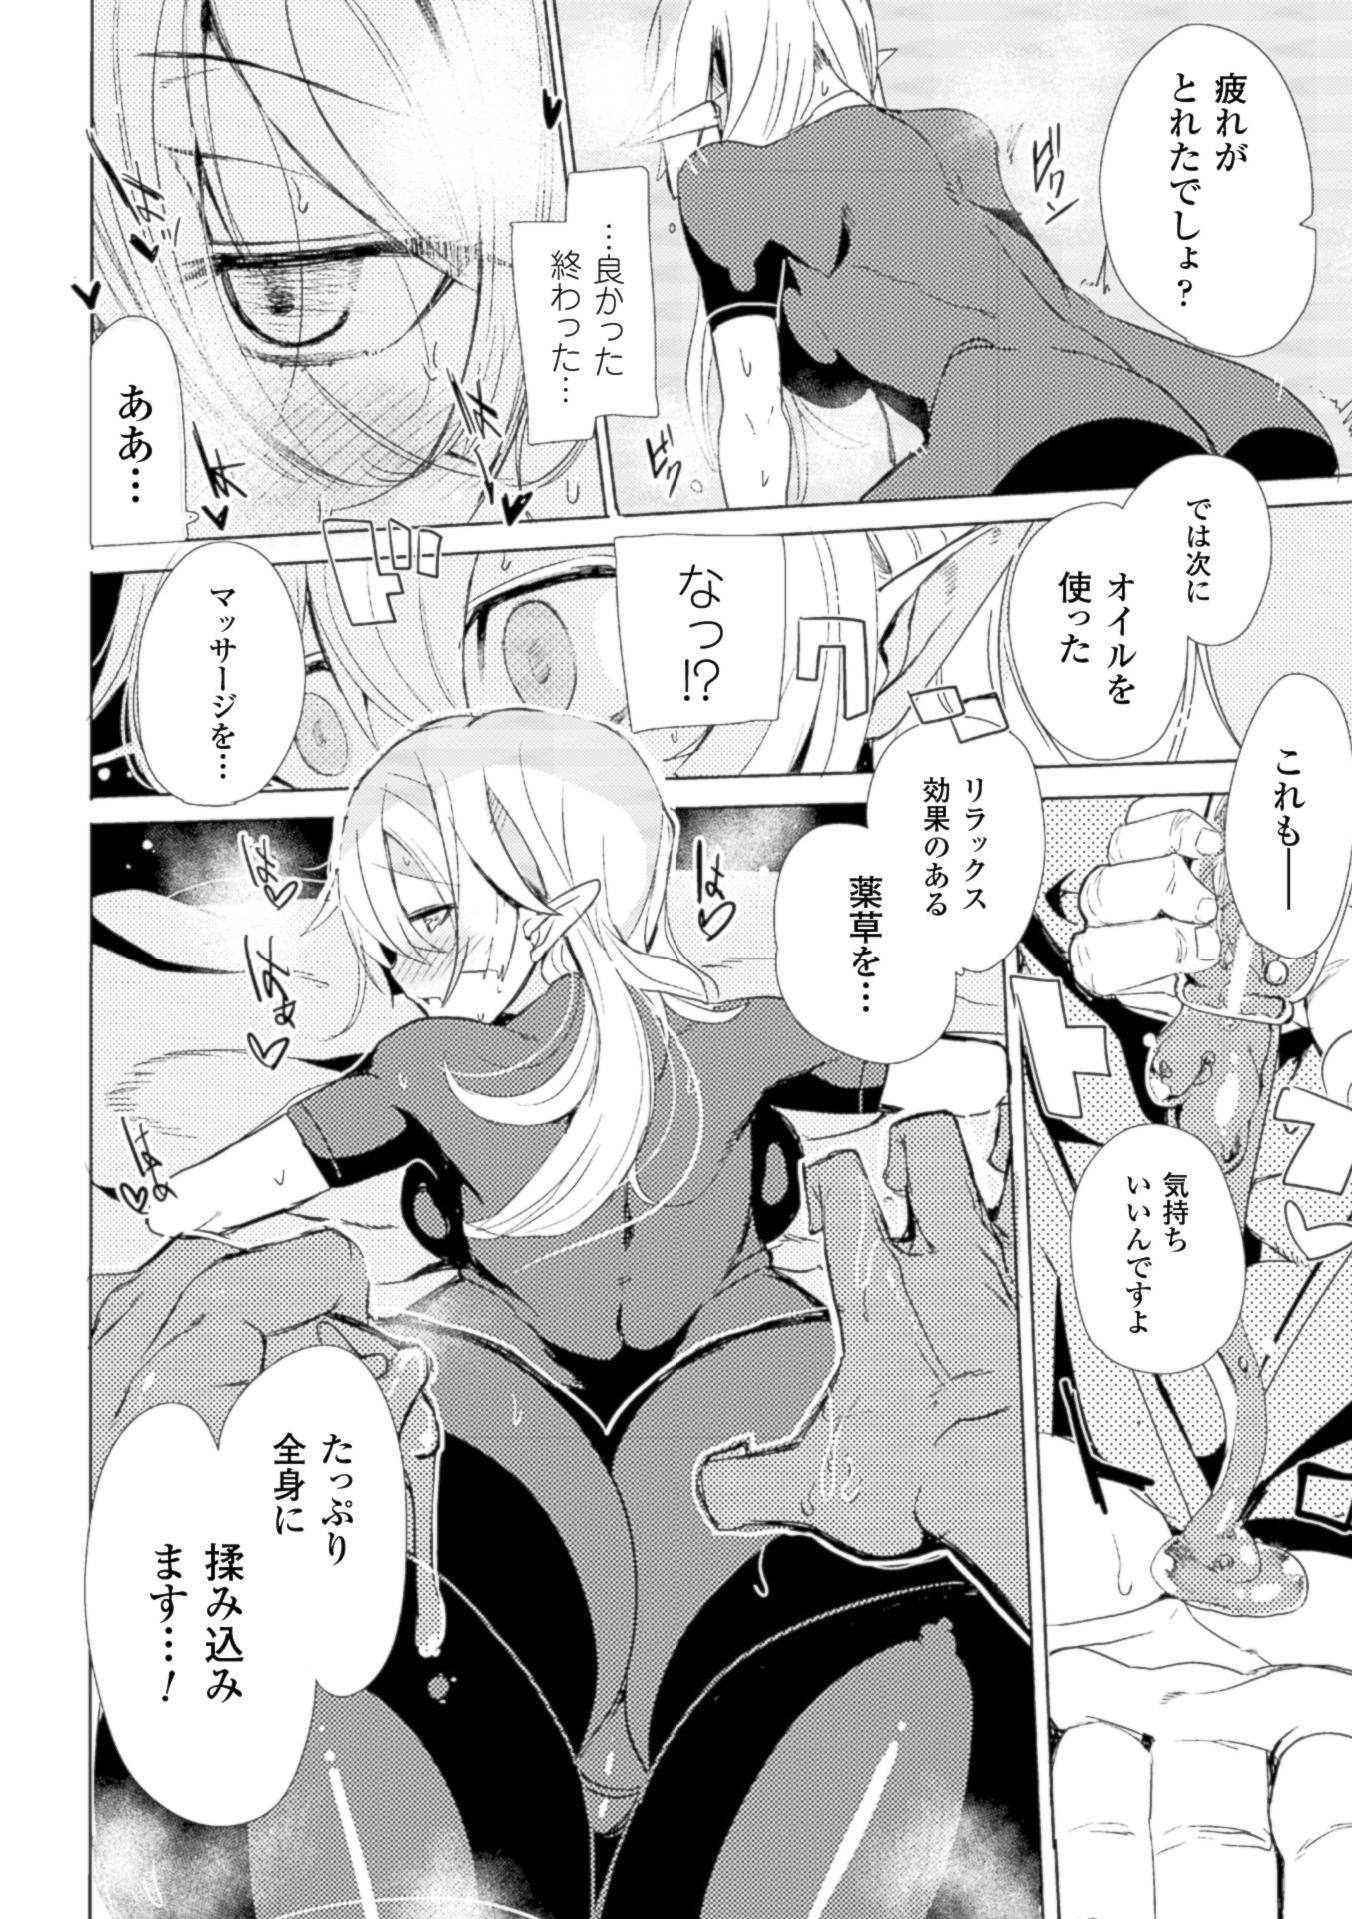 2D Comic Magazine Seikan Massage de Kyousei Etsuraku Detox! Vol. 2 47